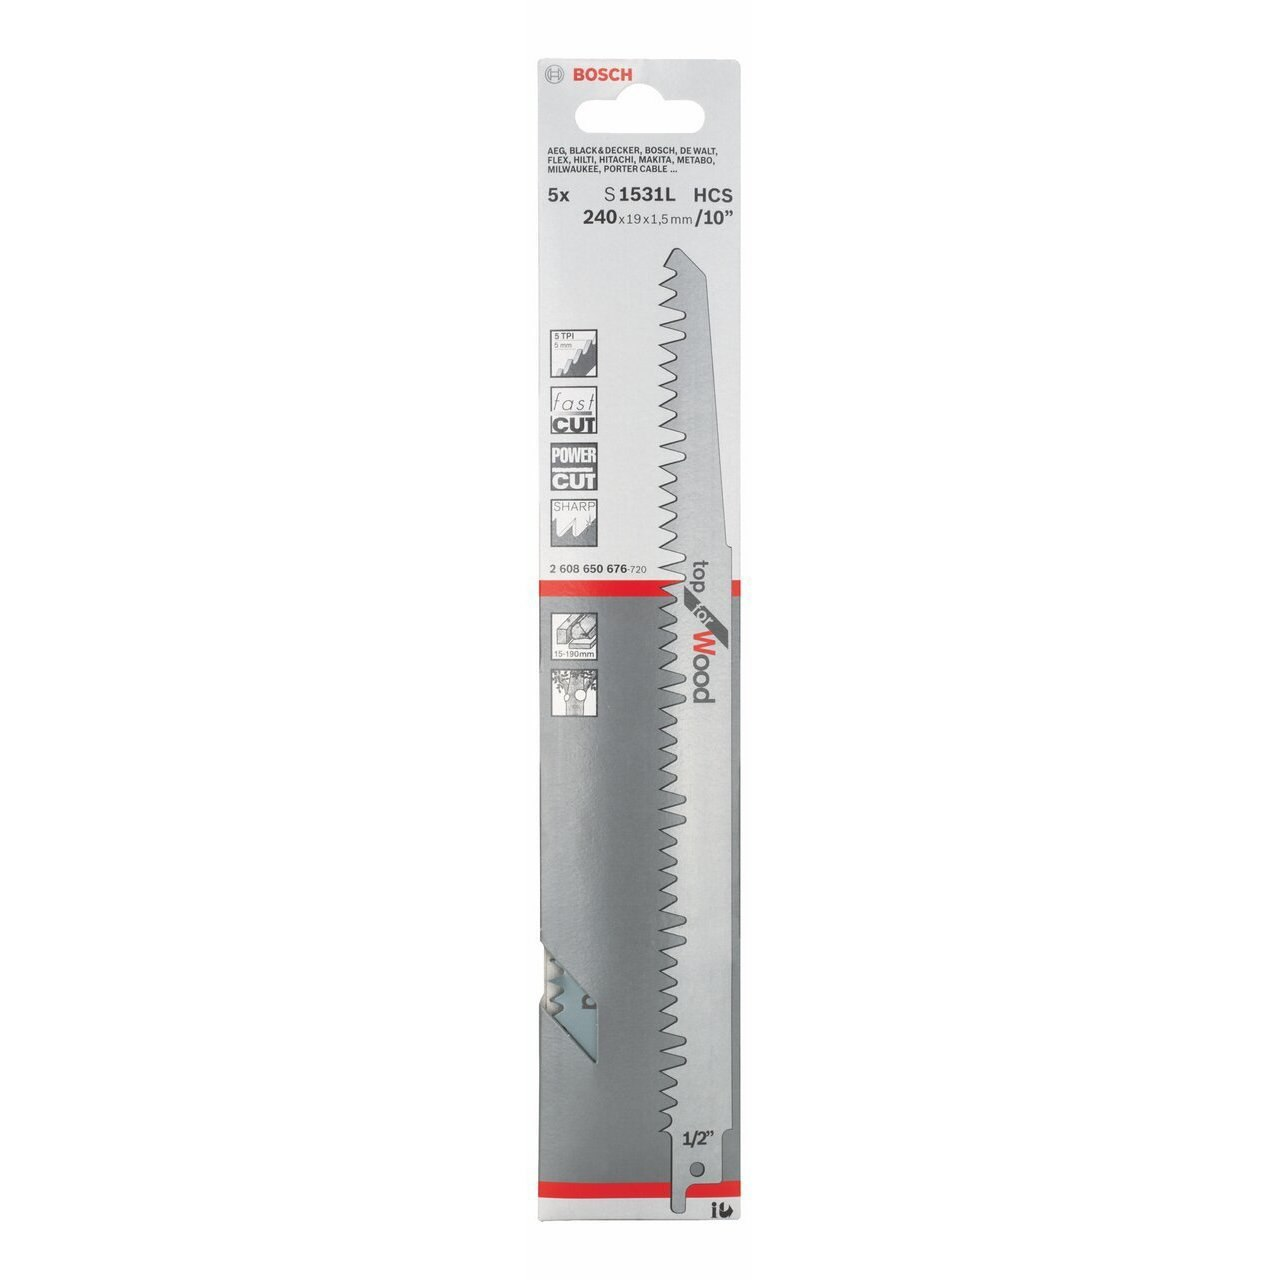 Funda port/átil para Exterior 125 x 35 cm Resistente Impermeable Faviye Tapa de Aire Acondicionado con pel/ícula de Aluminio de Doble Cara